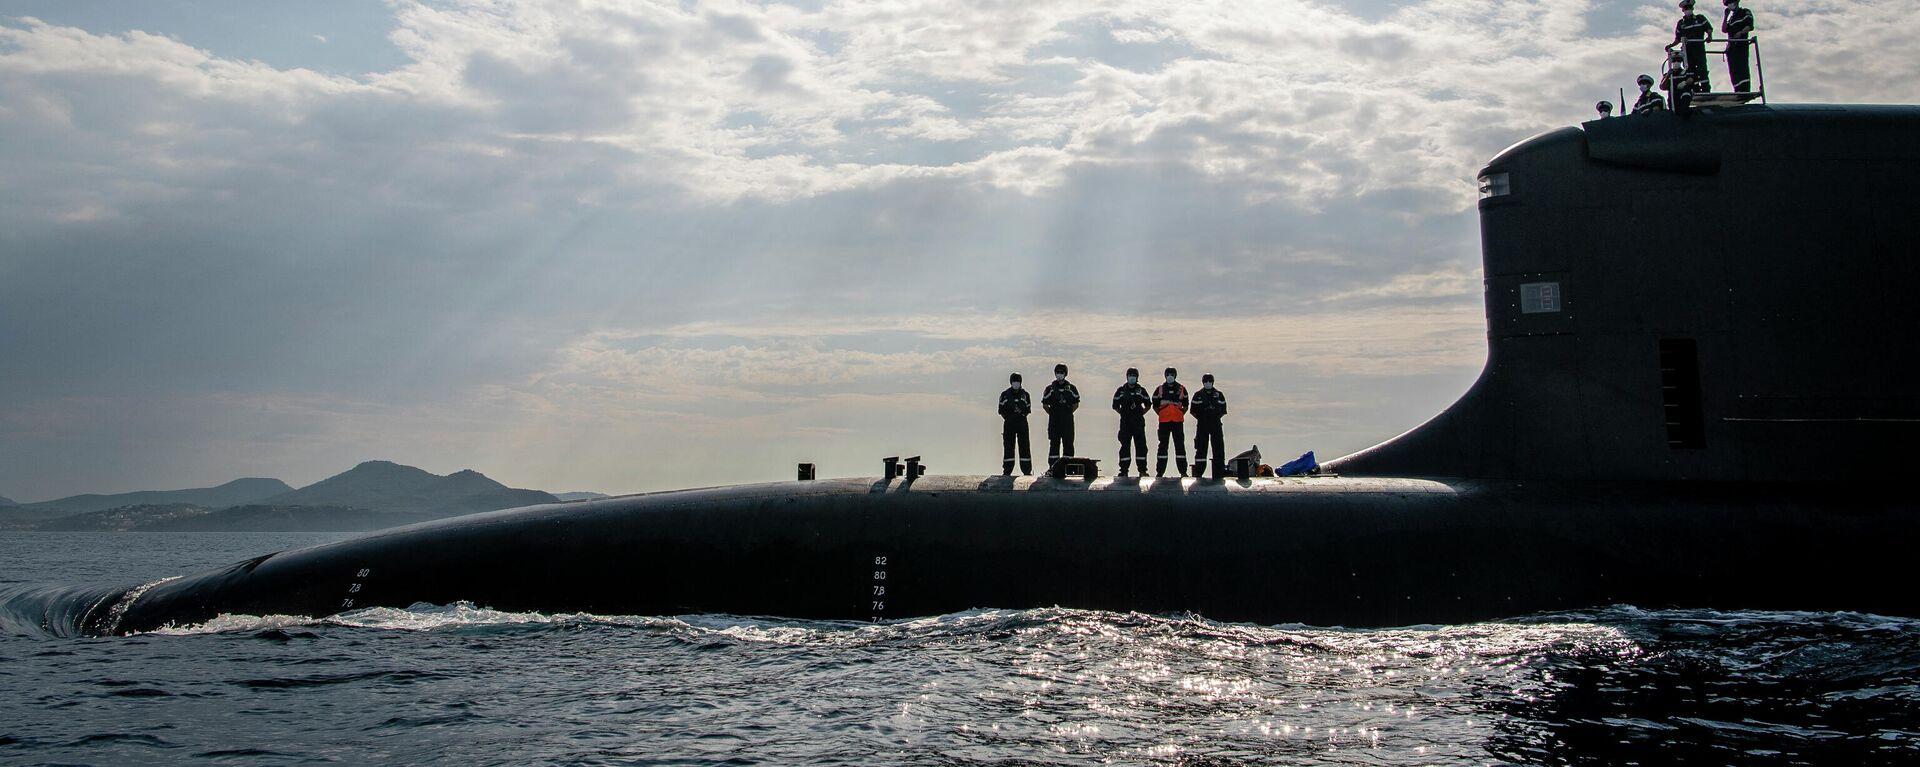 Un submarino de la naviera francesa Naval Group - Sputnik Mundo, 1920, 21.09.2021